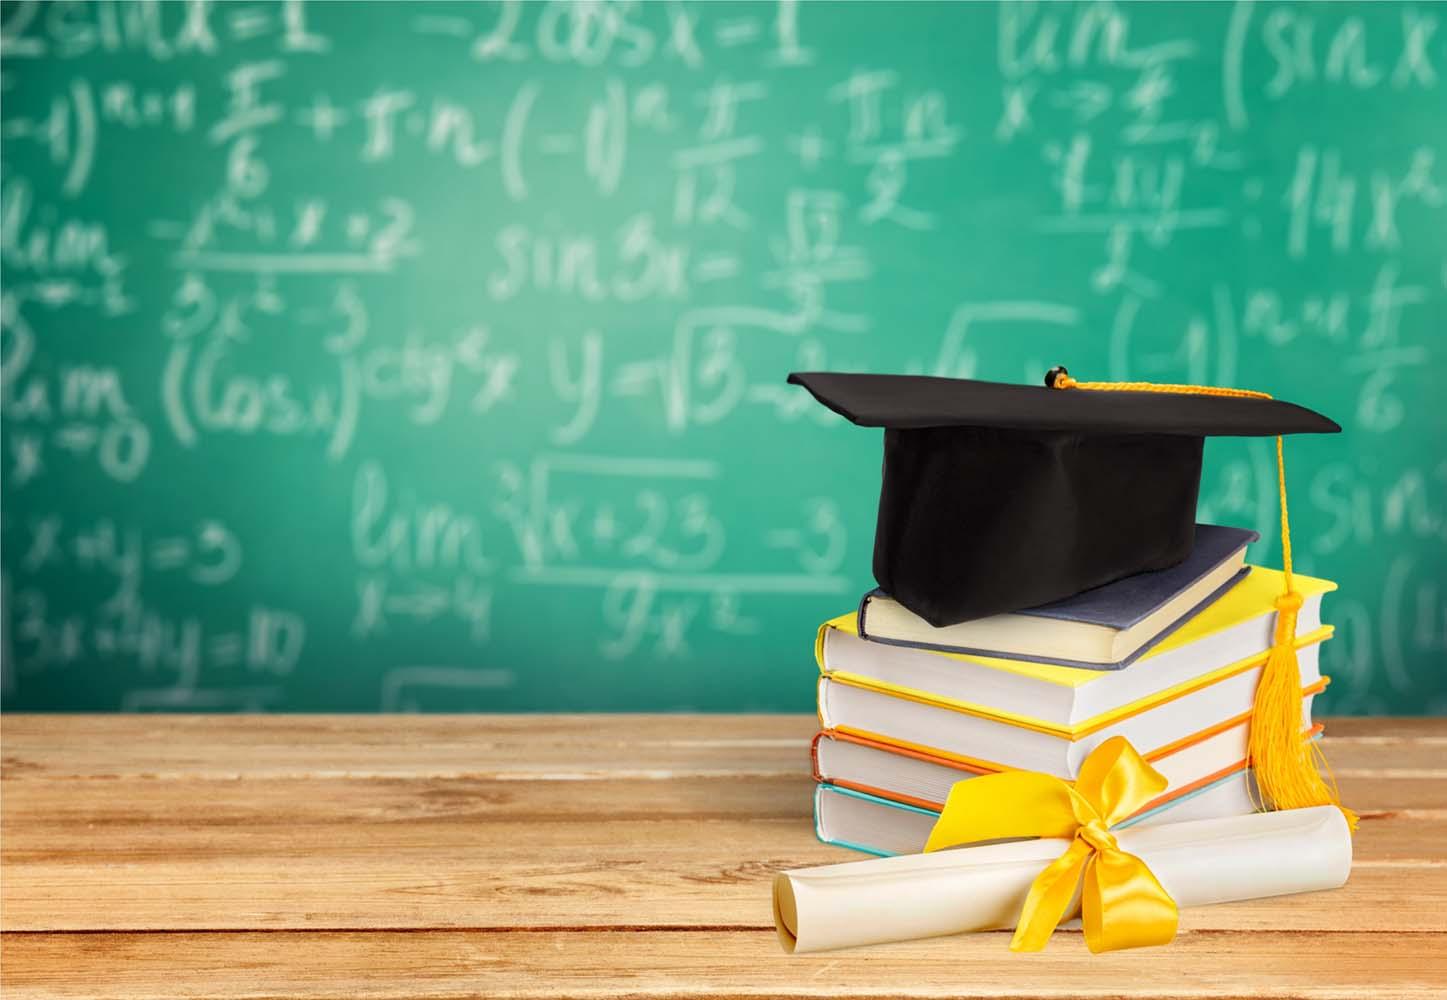 Seniors Graduate with Free College Education